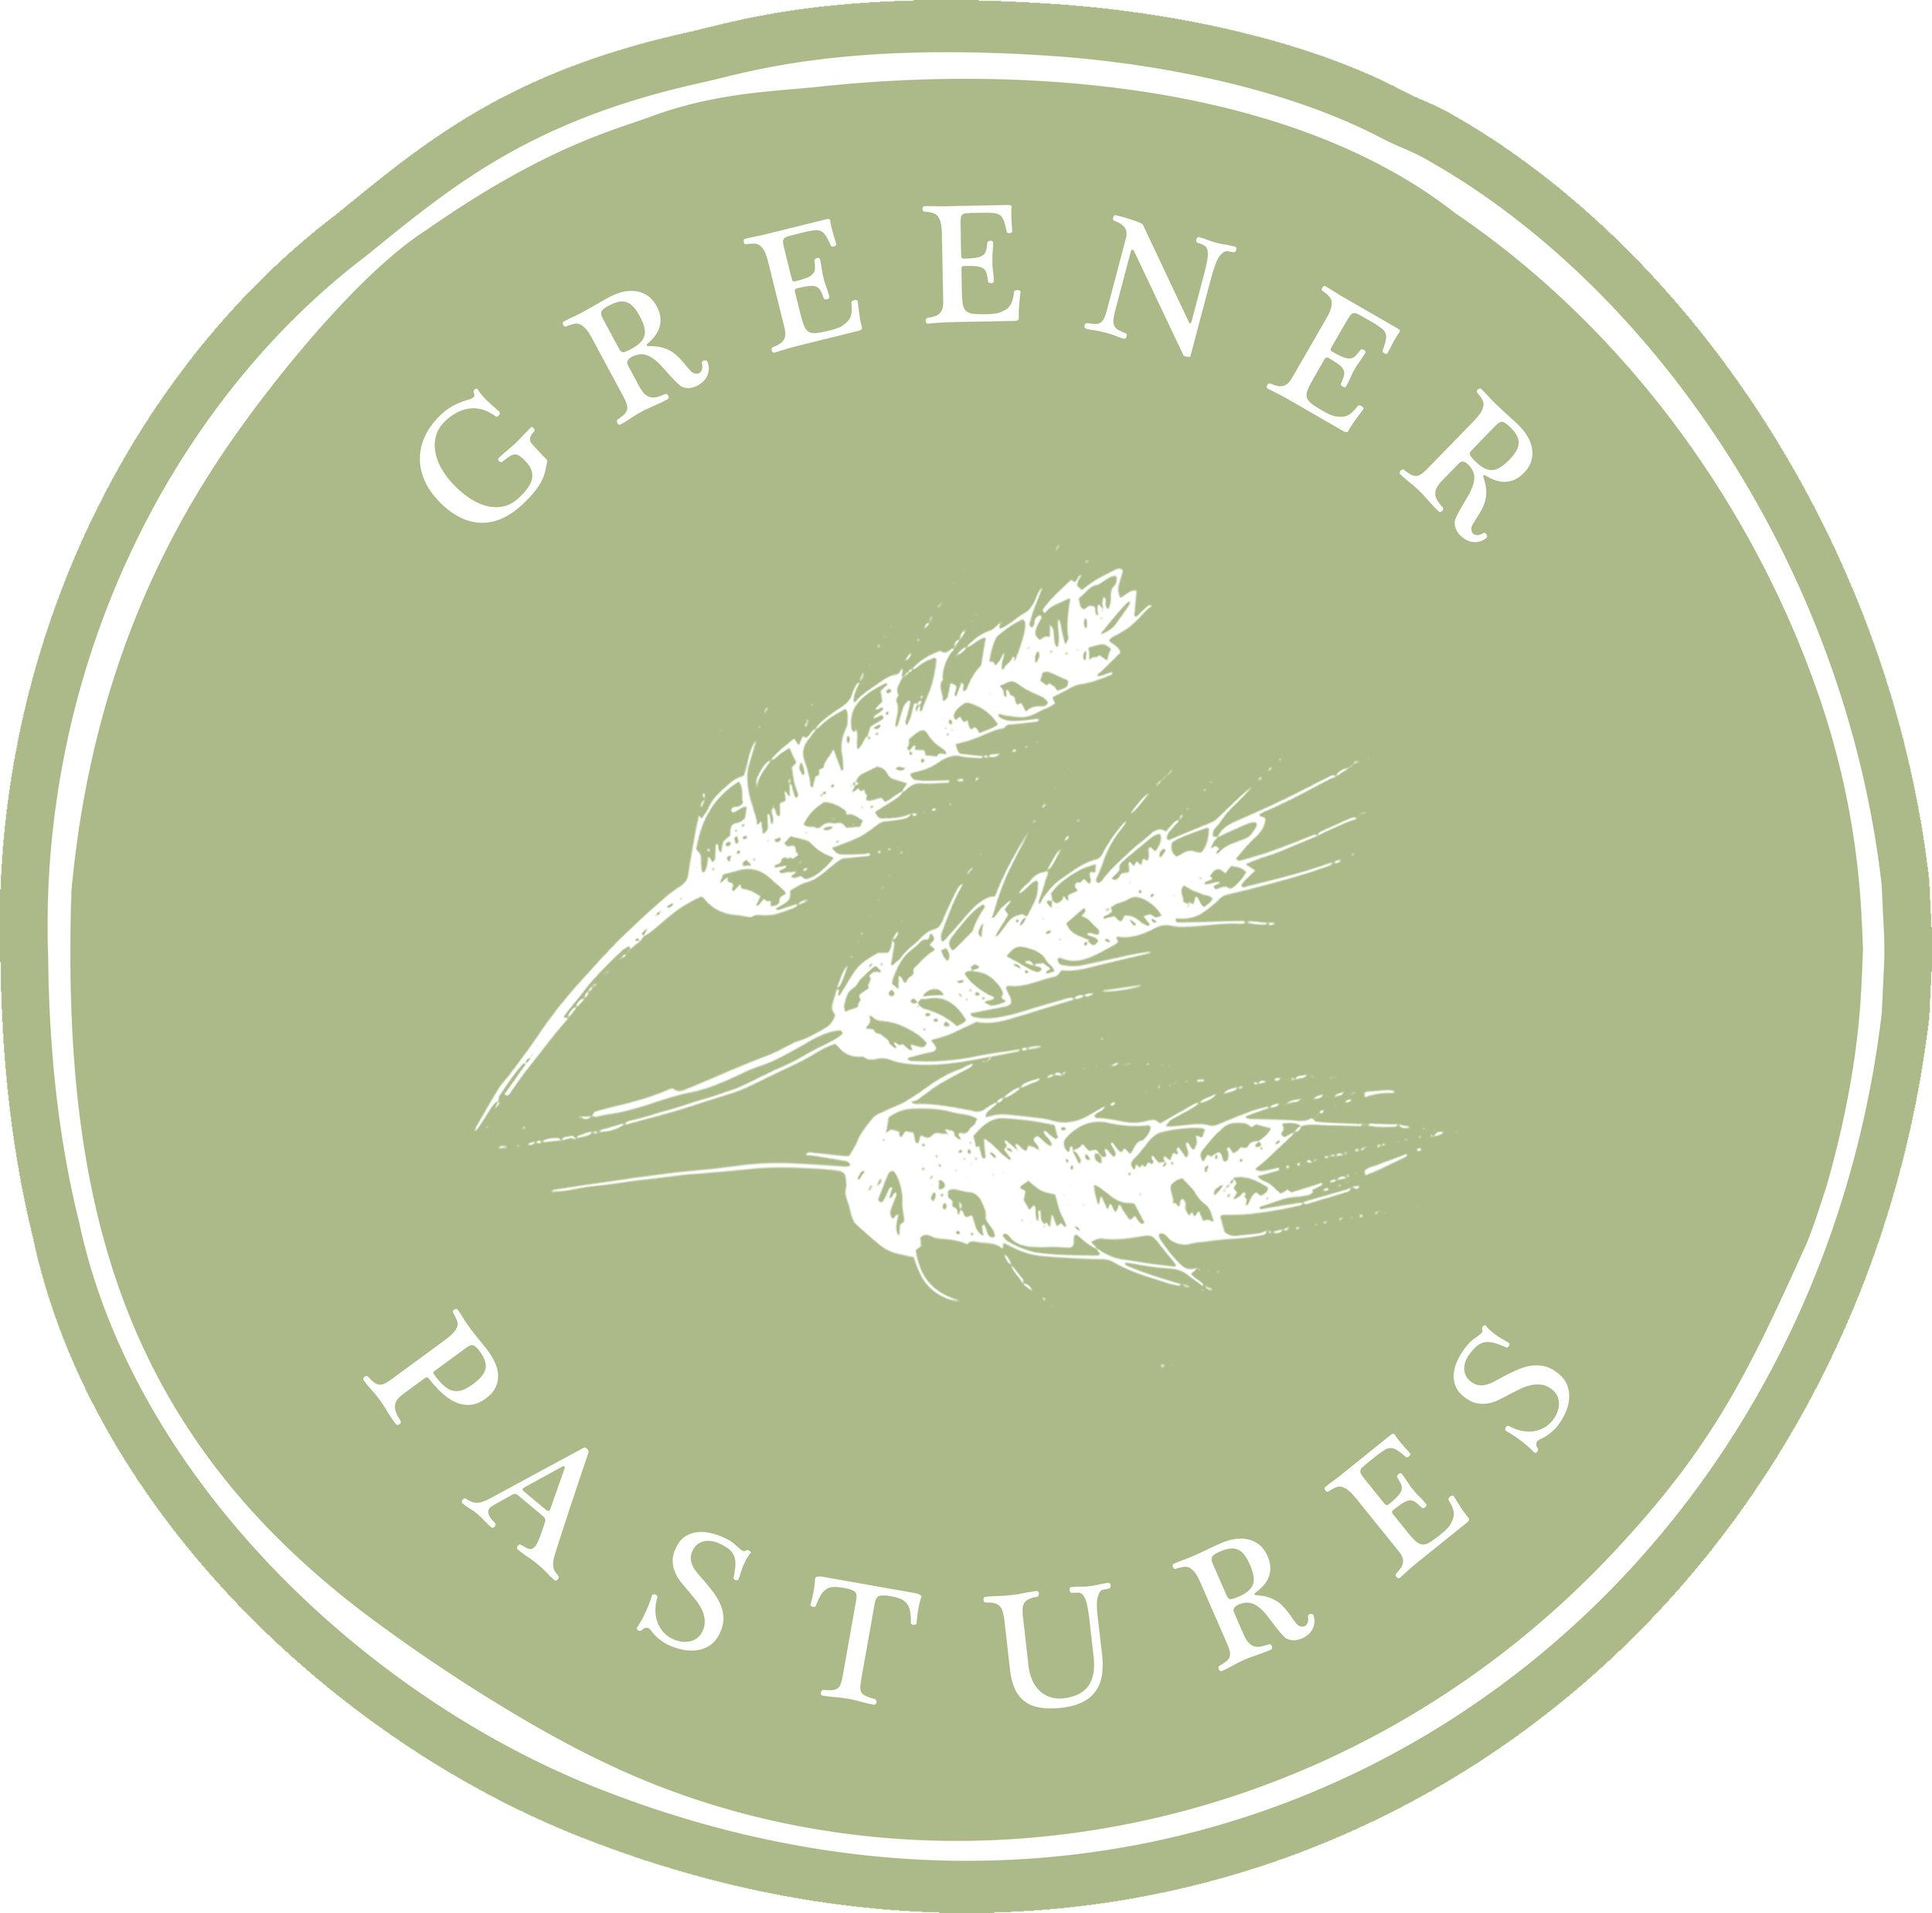 greenerpastures_submark2_color.jpg